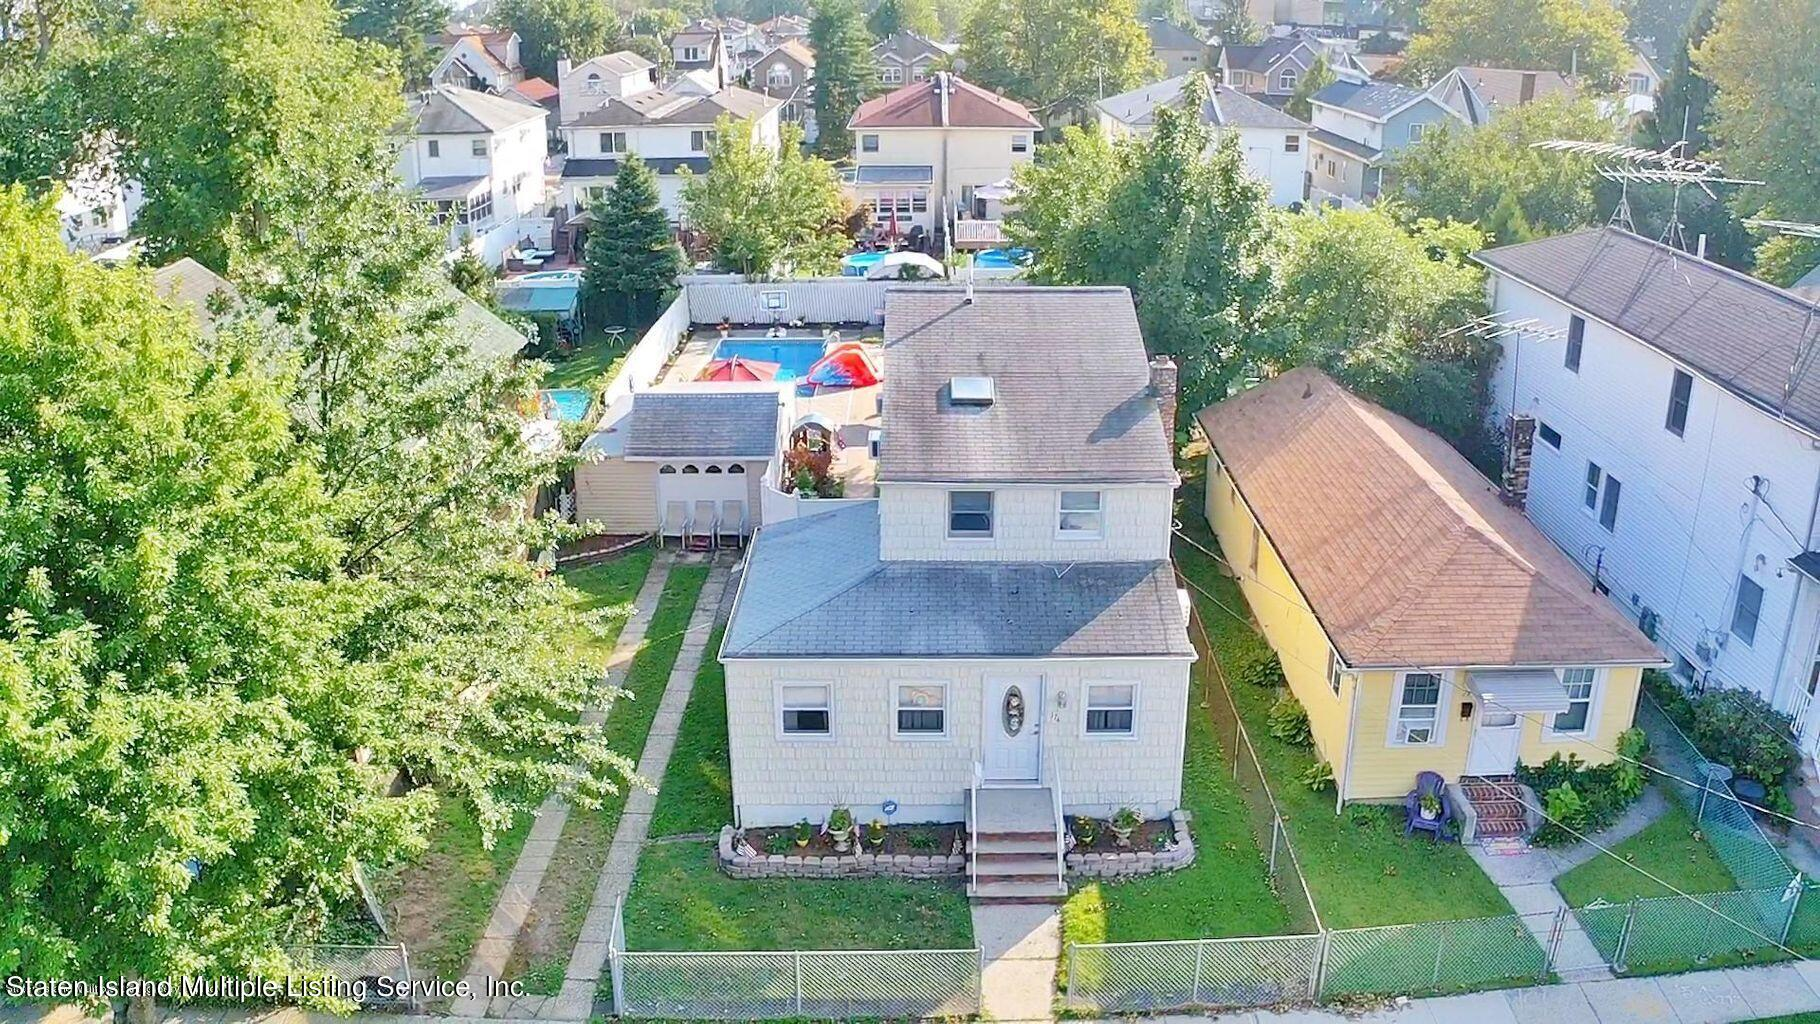 Single Family - Detached 174 Wiman Avenue  Staten Island, NY 10308, MLS-1145983-10